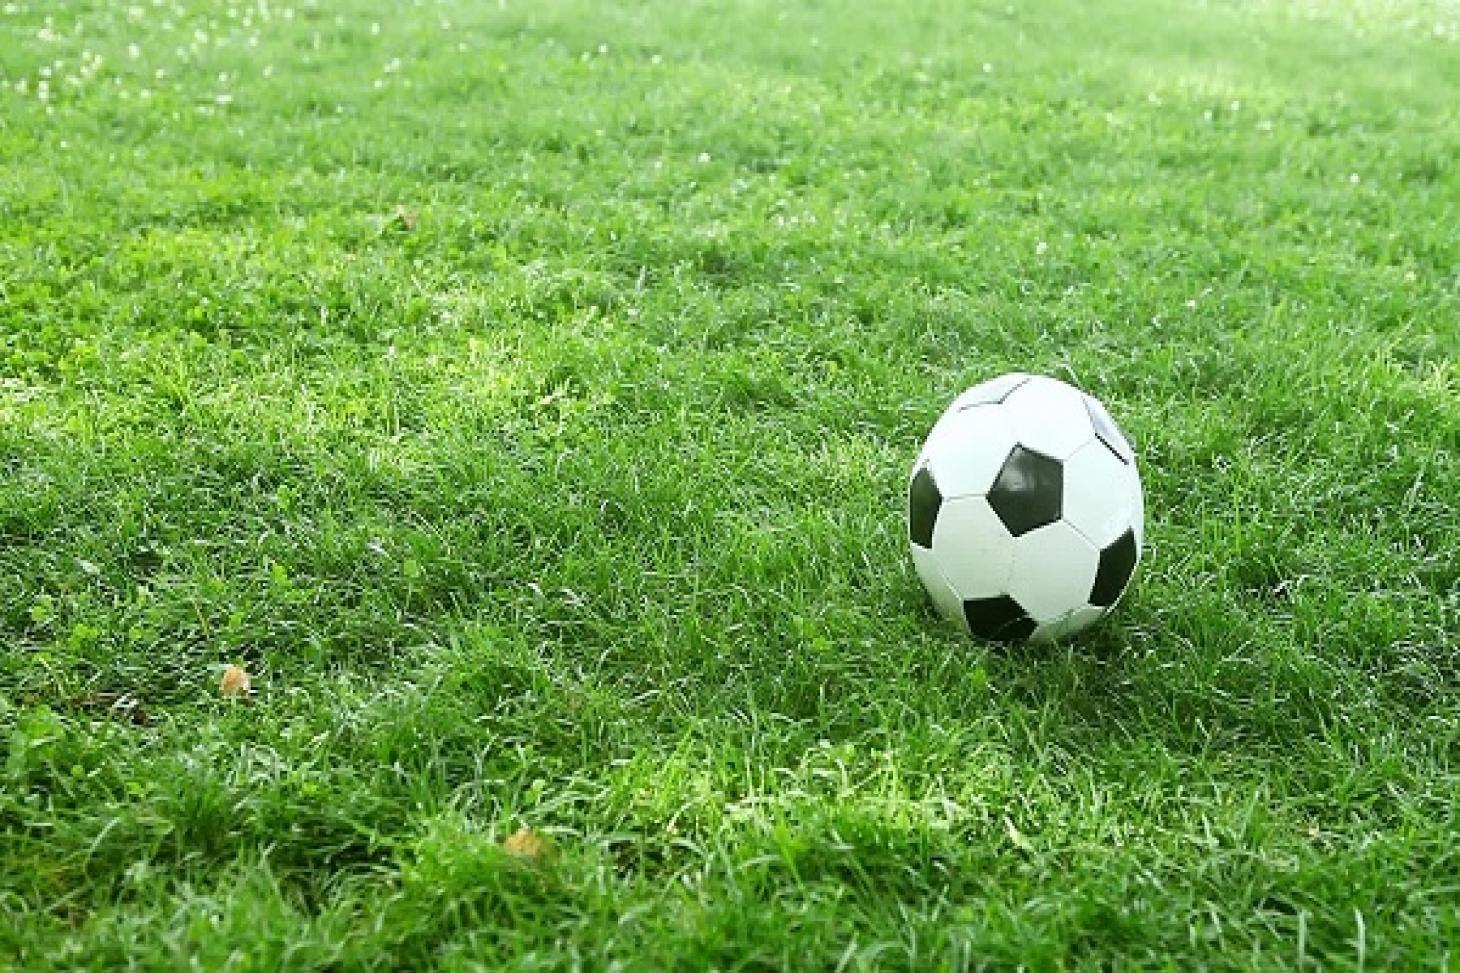 Tymon Park 11 a side | Grass football pitch